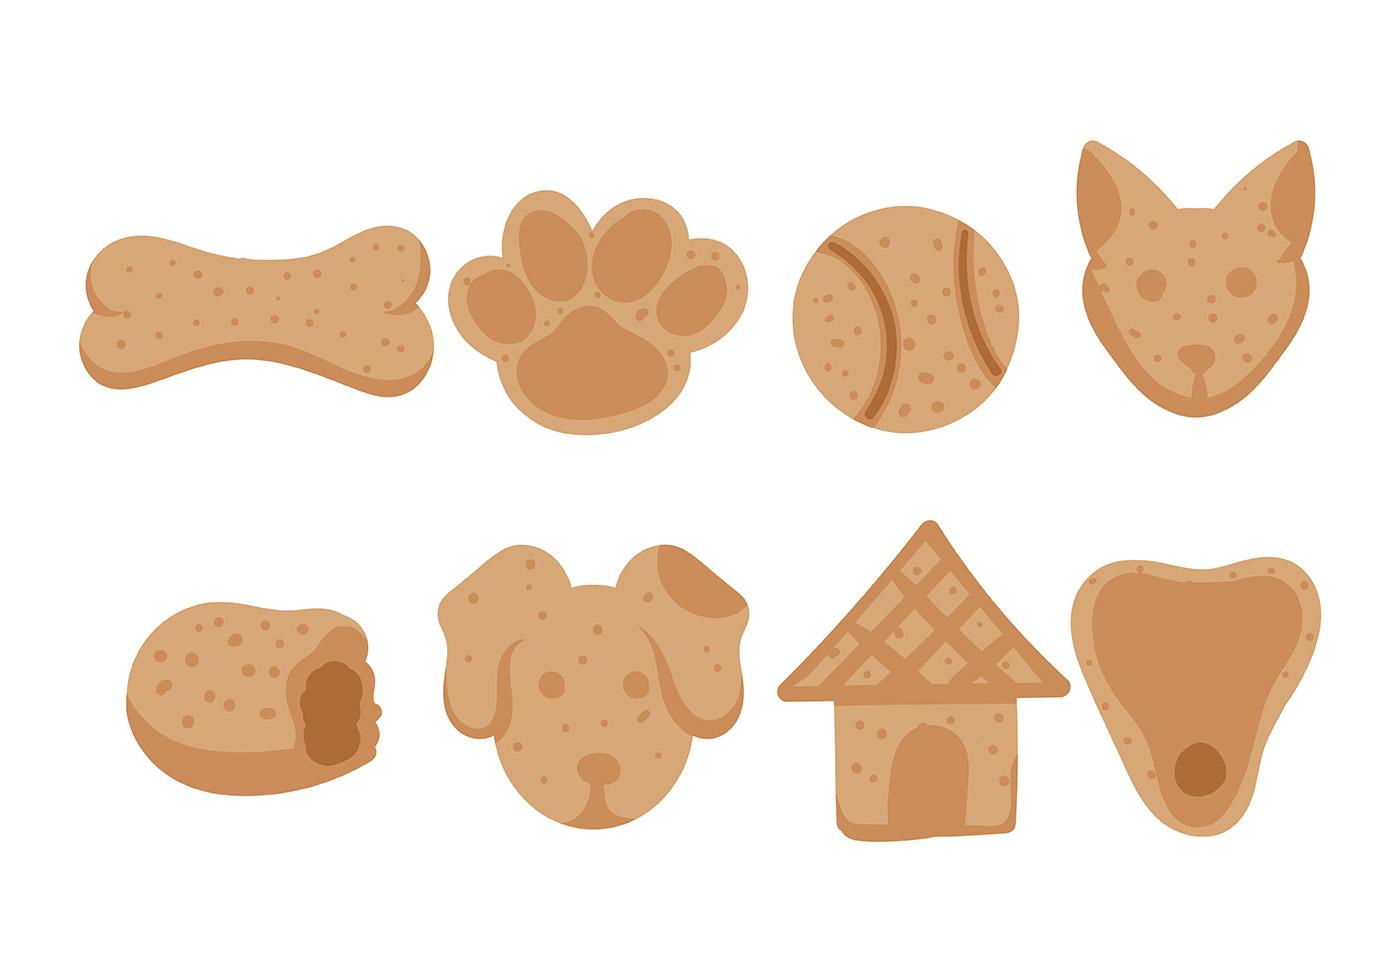 Dog Biscuit Icon Vector - Download Free Vectors, Clipart